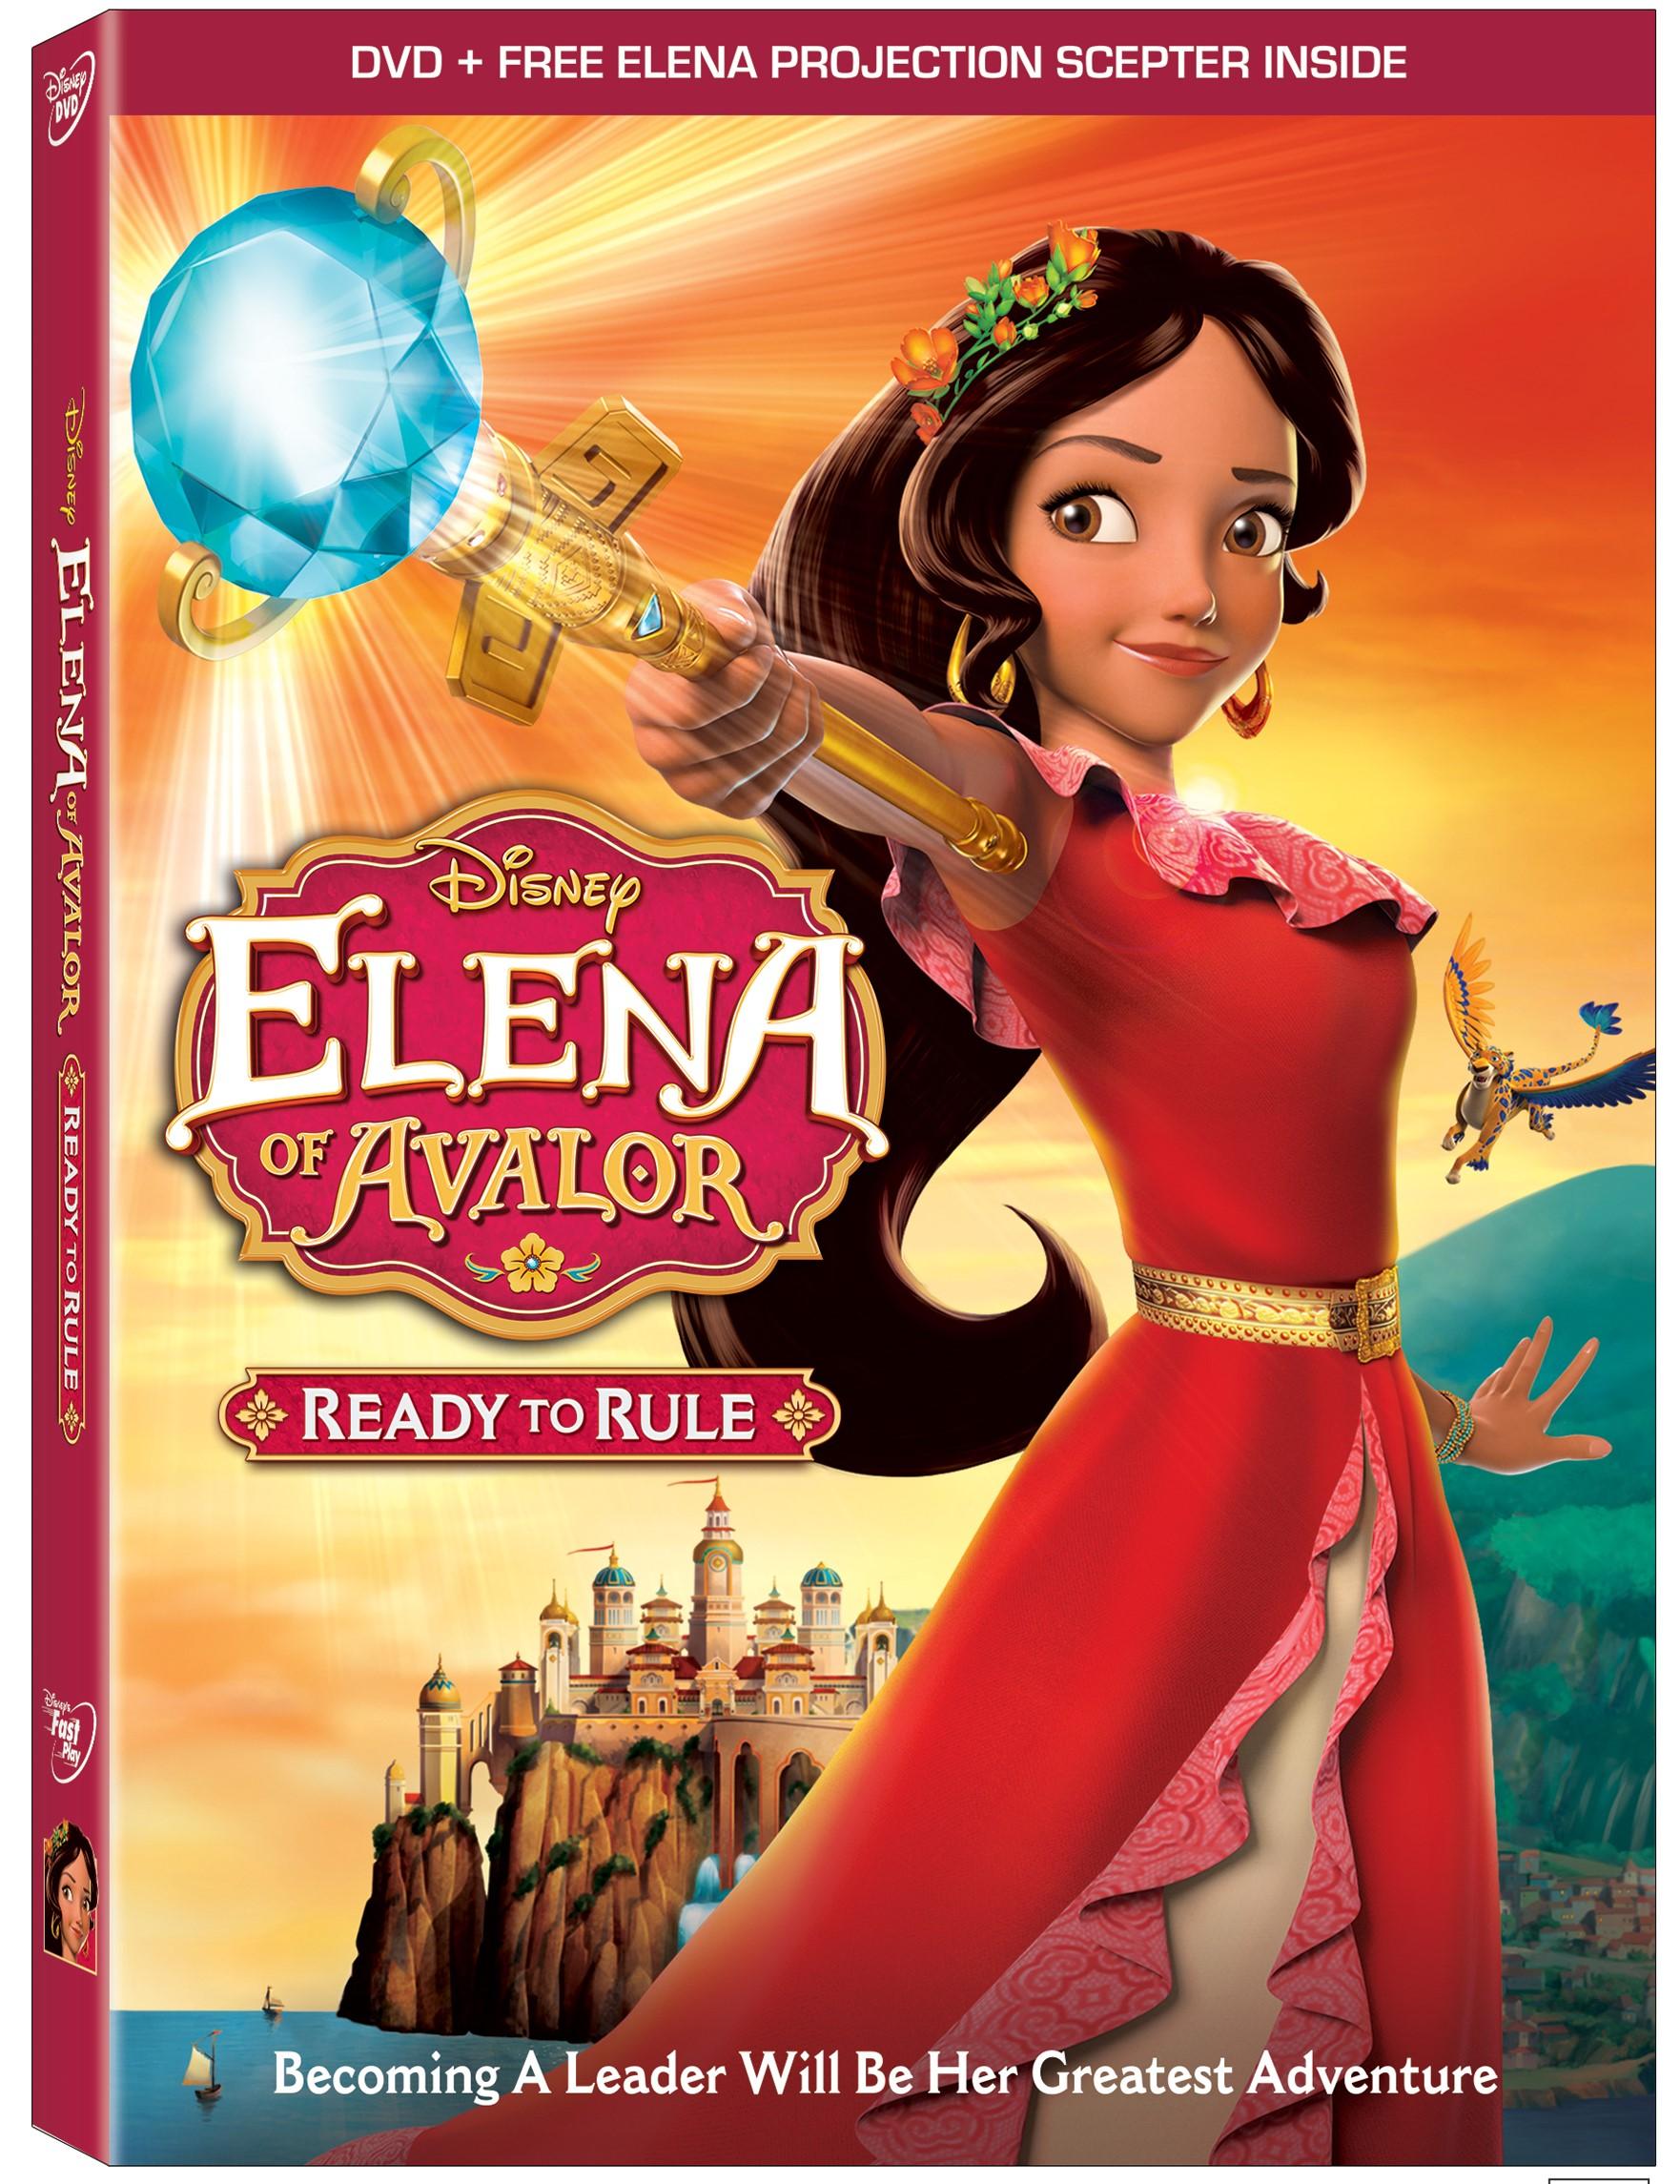 Elena of Avalor videography